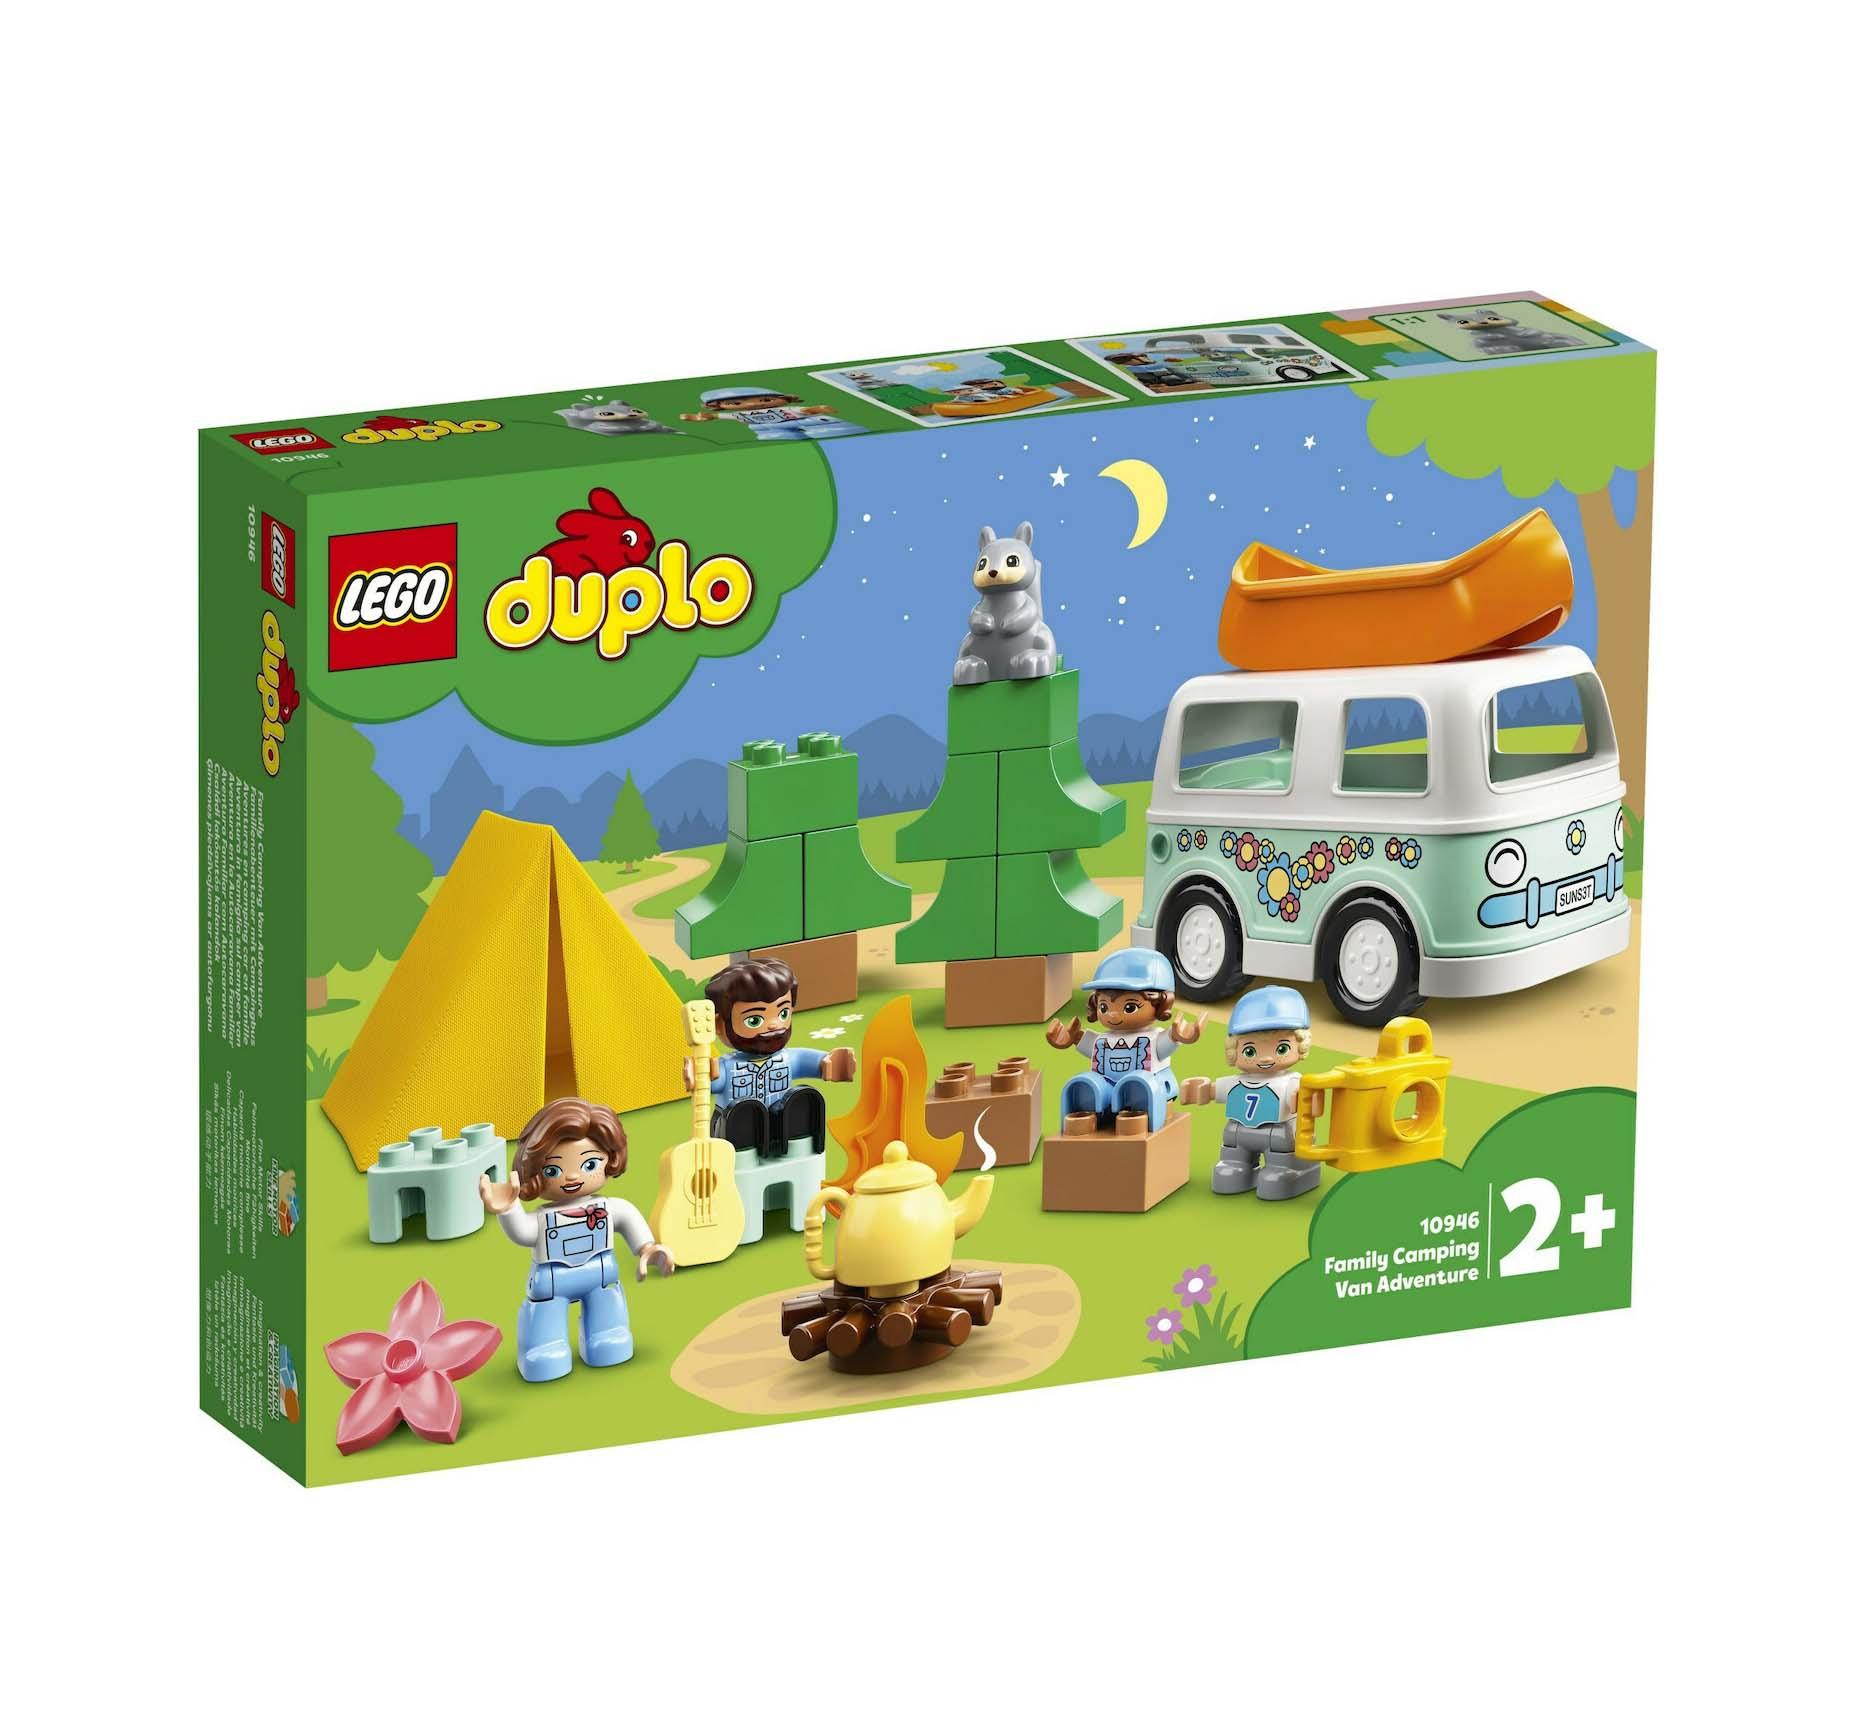 Lego Duplo: Family Camping Van Adventure 10946